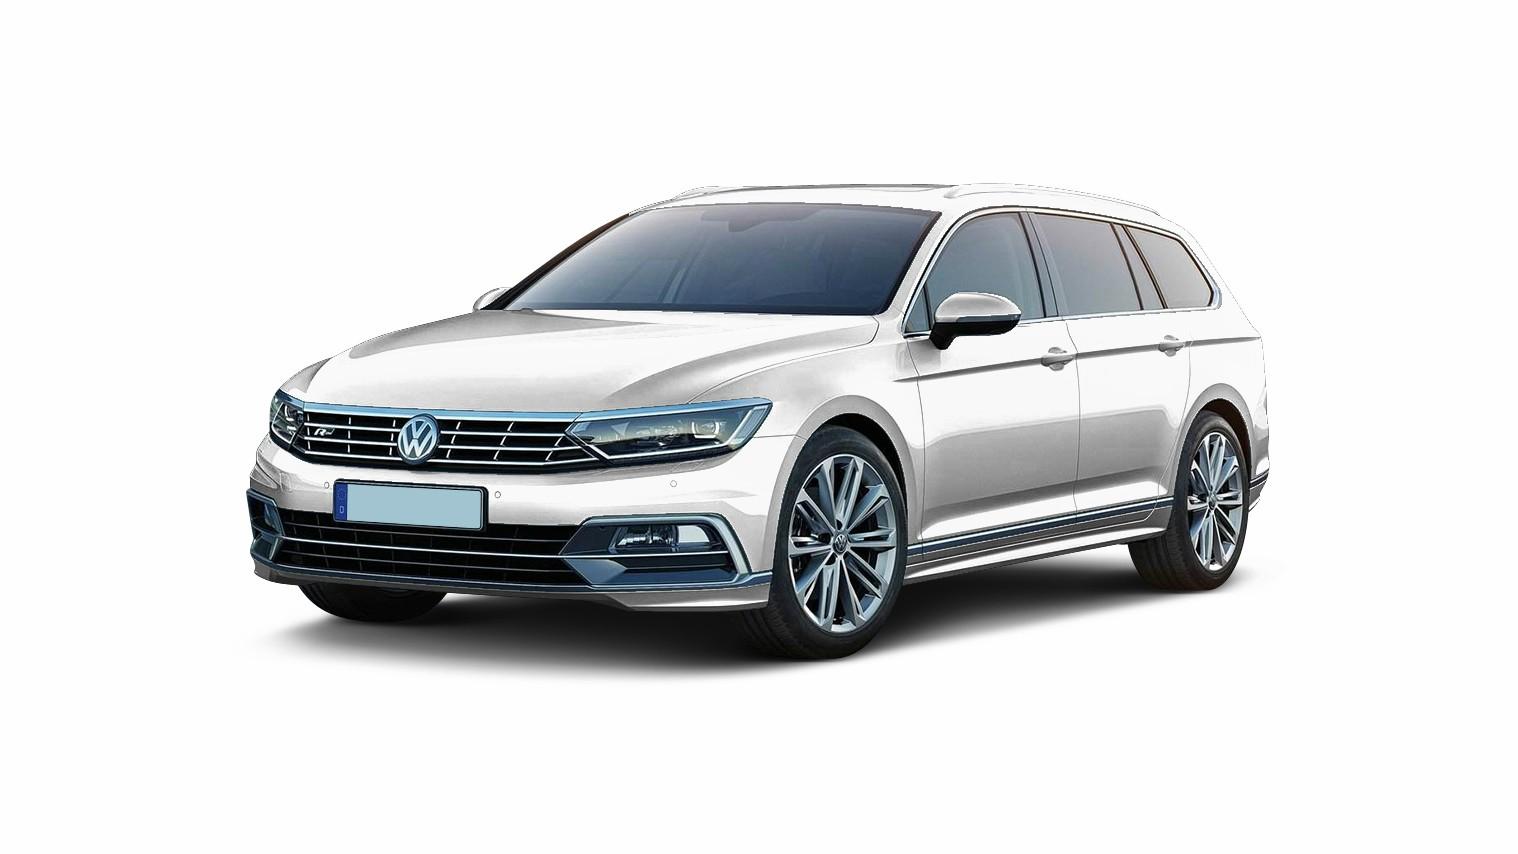 Acheter Volkswagen Passat SW Nouvelle Confortline+GPS Surequipe Confortline+GPS Surequipe chez un mandataire auto